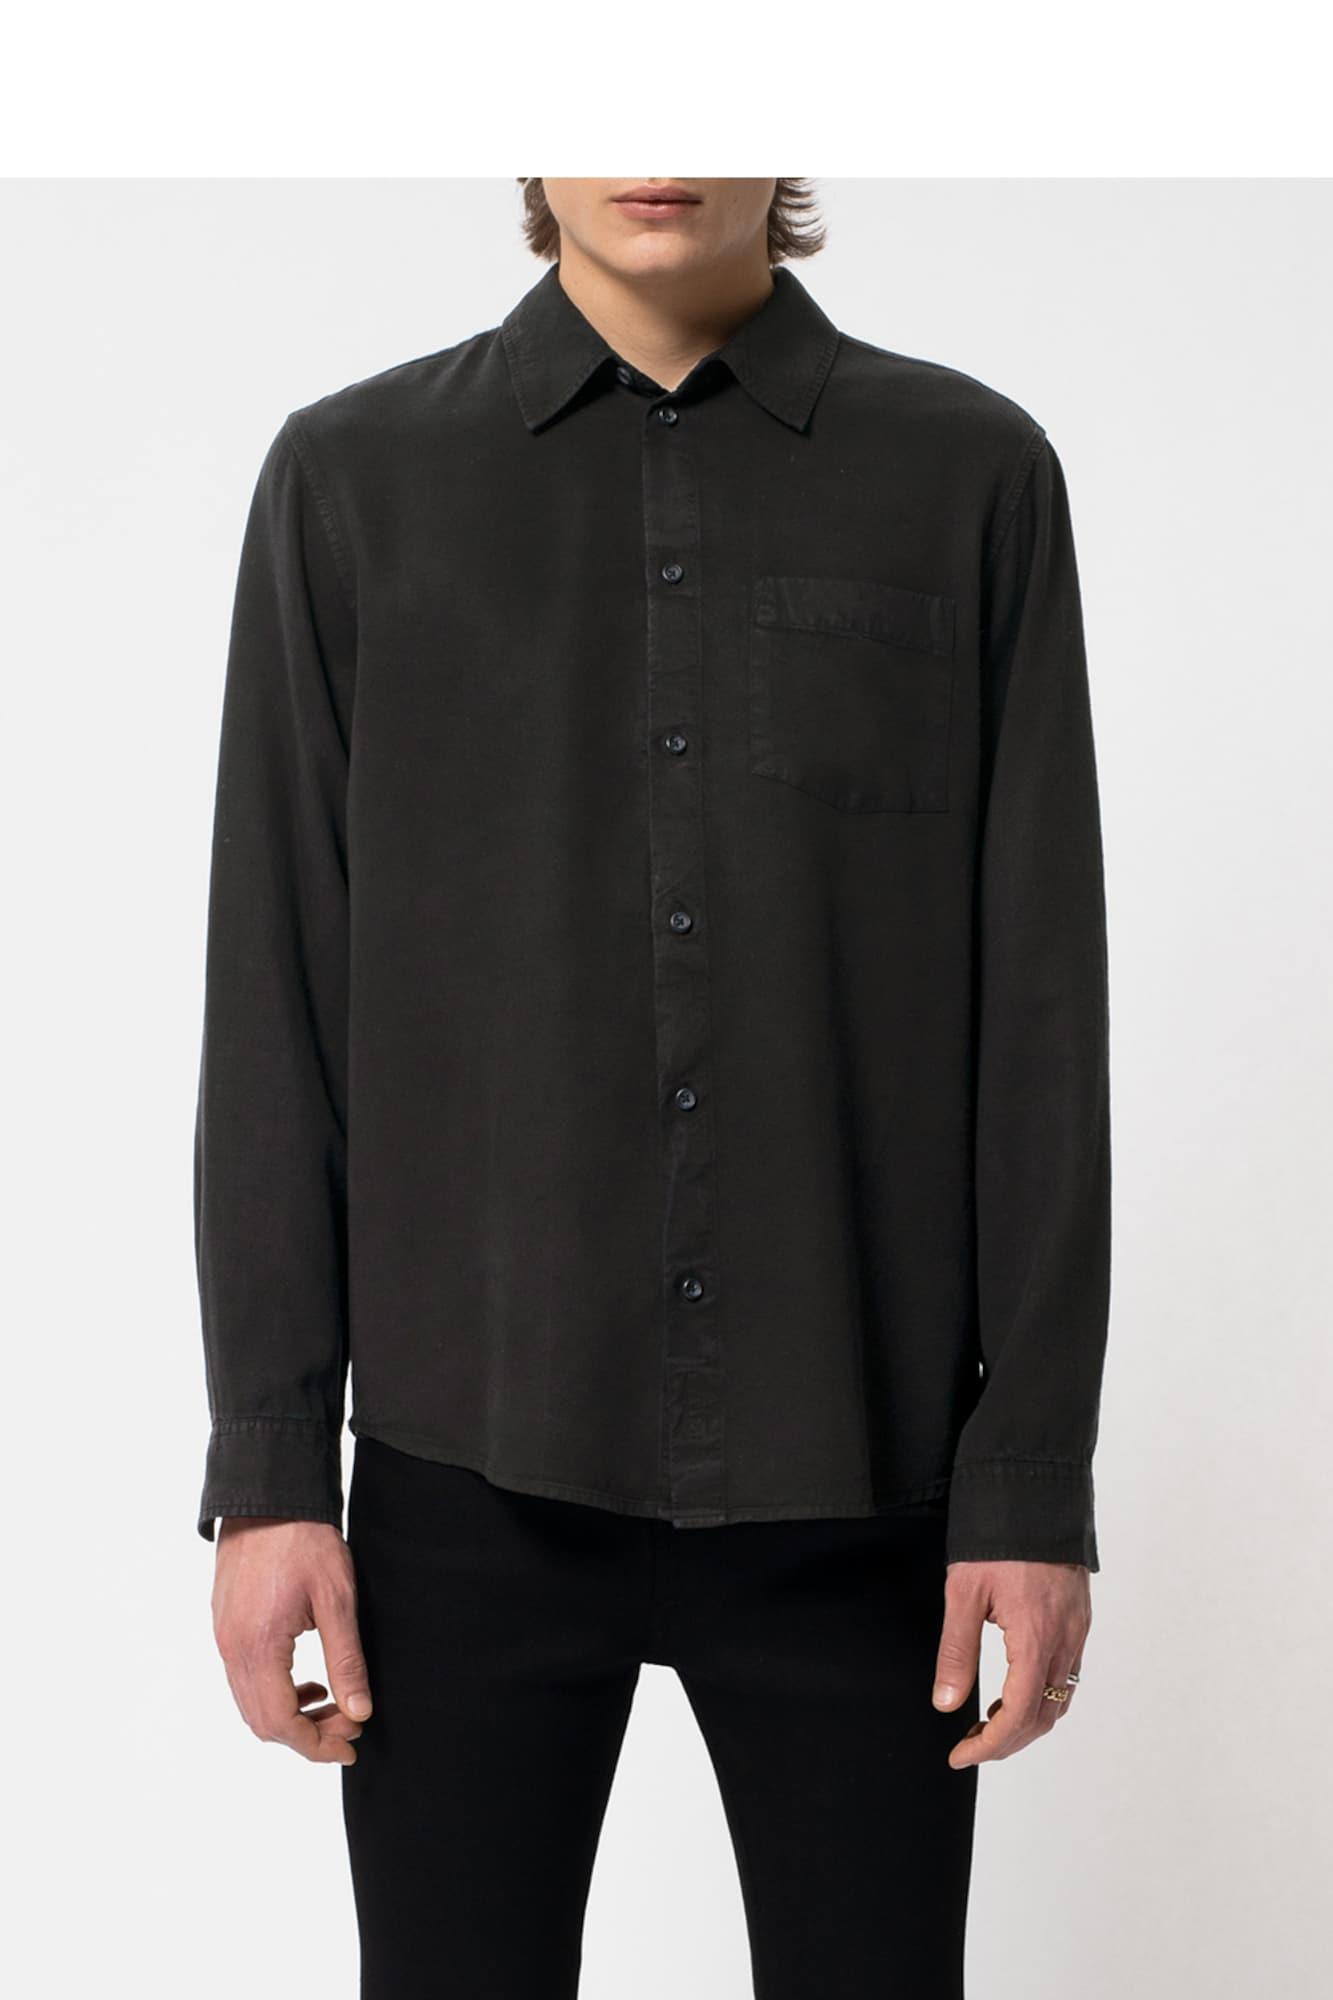 Nudie Jeans Co Skjorta ' Chuck Smooth Twill '  svart